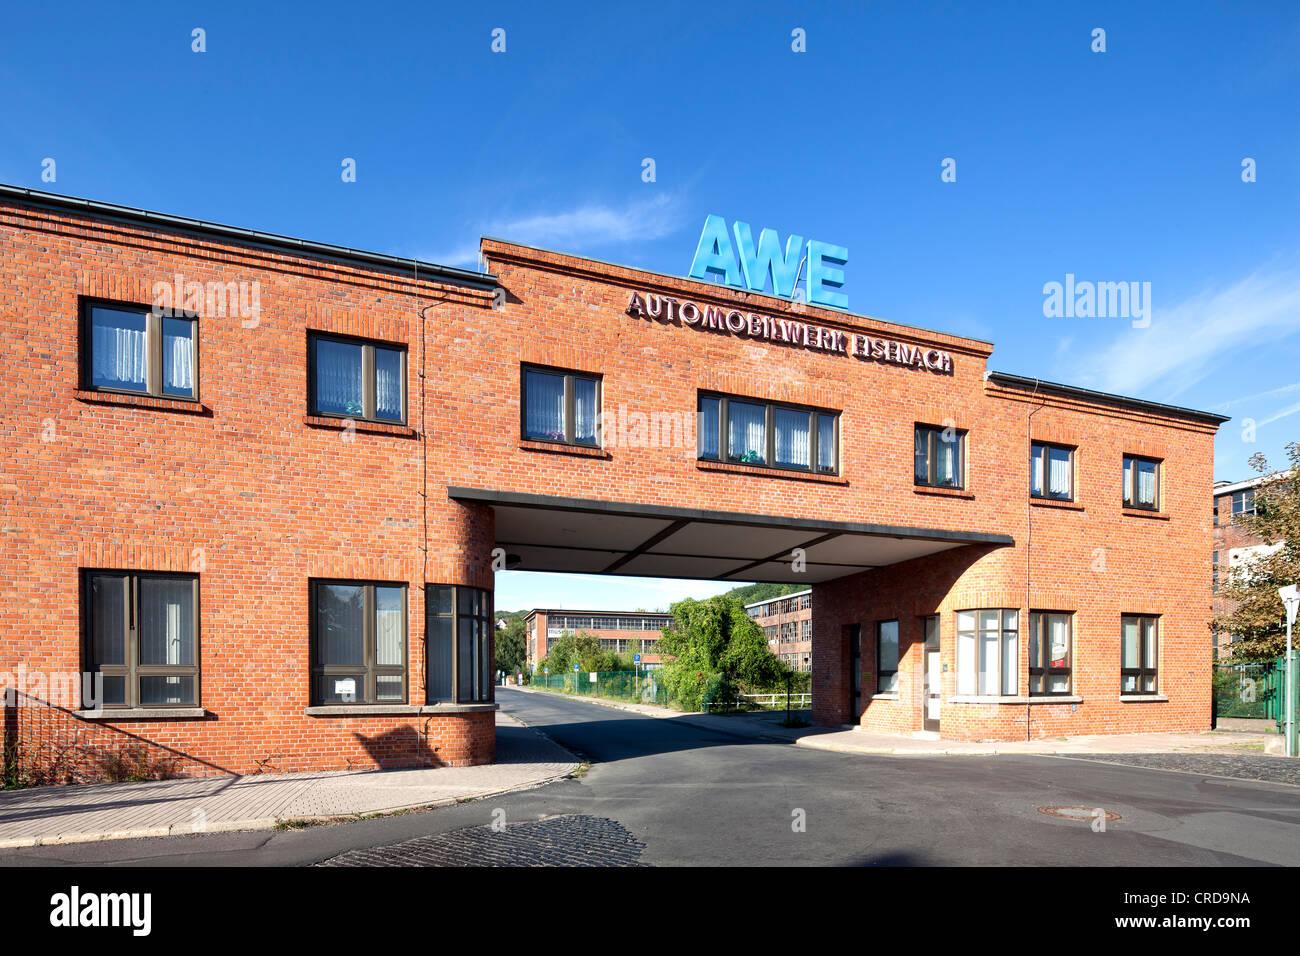 Automobilwerke Eisenach, automobile plant, gatehouse, Eisenach, Thuringia, Germany, Europe, PublicGround Stock Photo